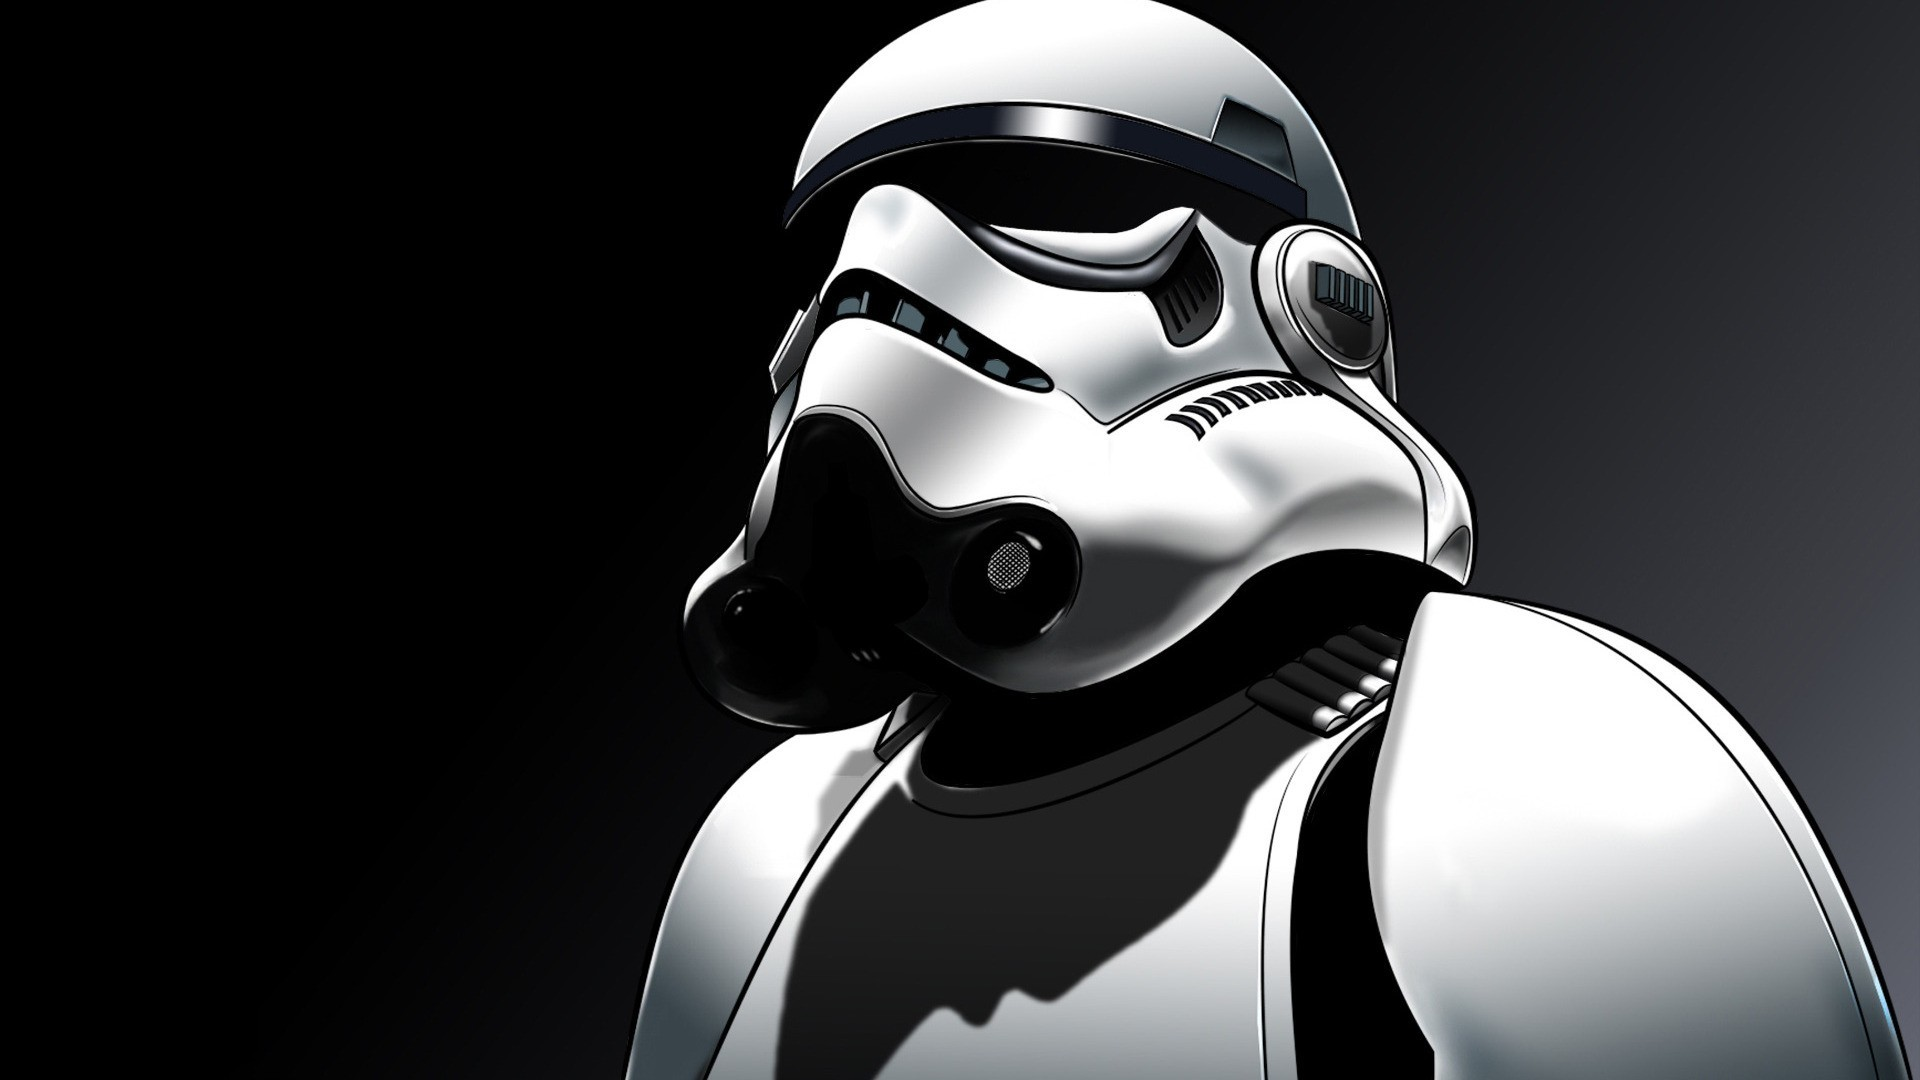 Star Wars HD Wallpapers 1920×1080